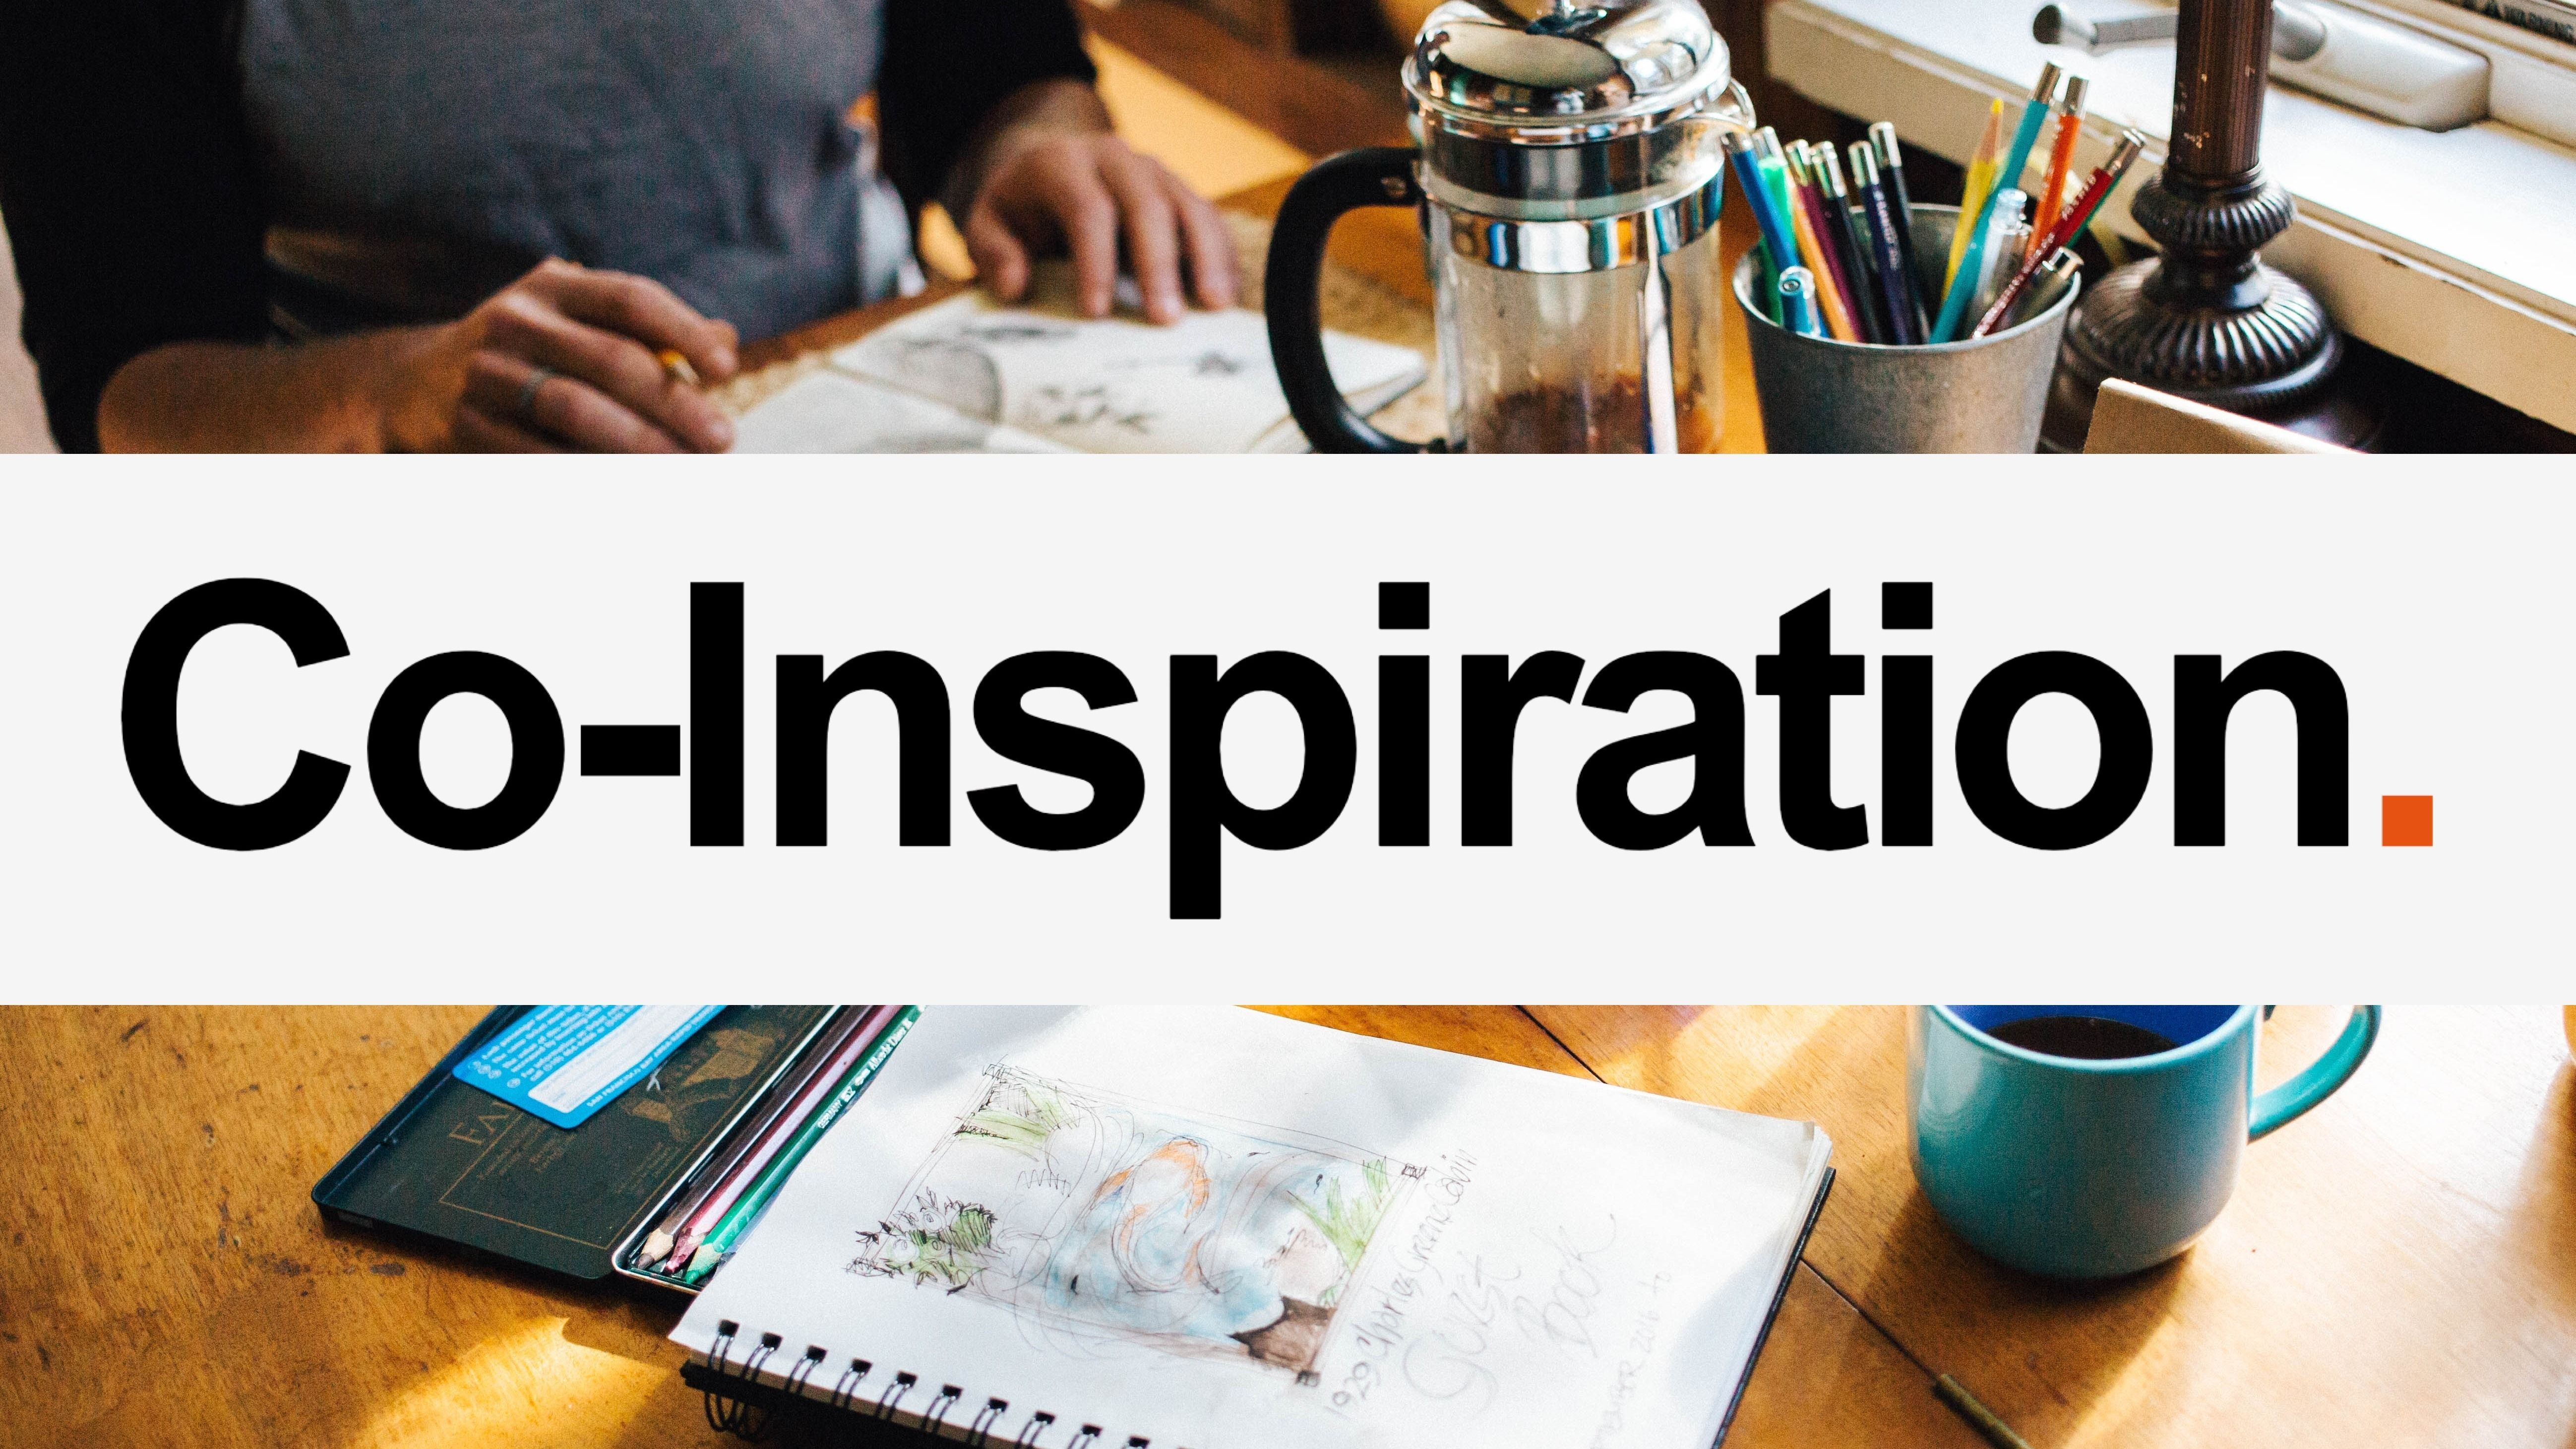 Co-Inspiration